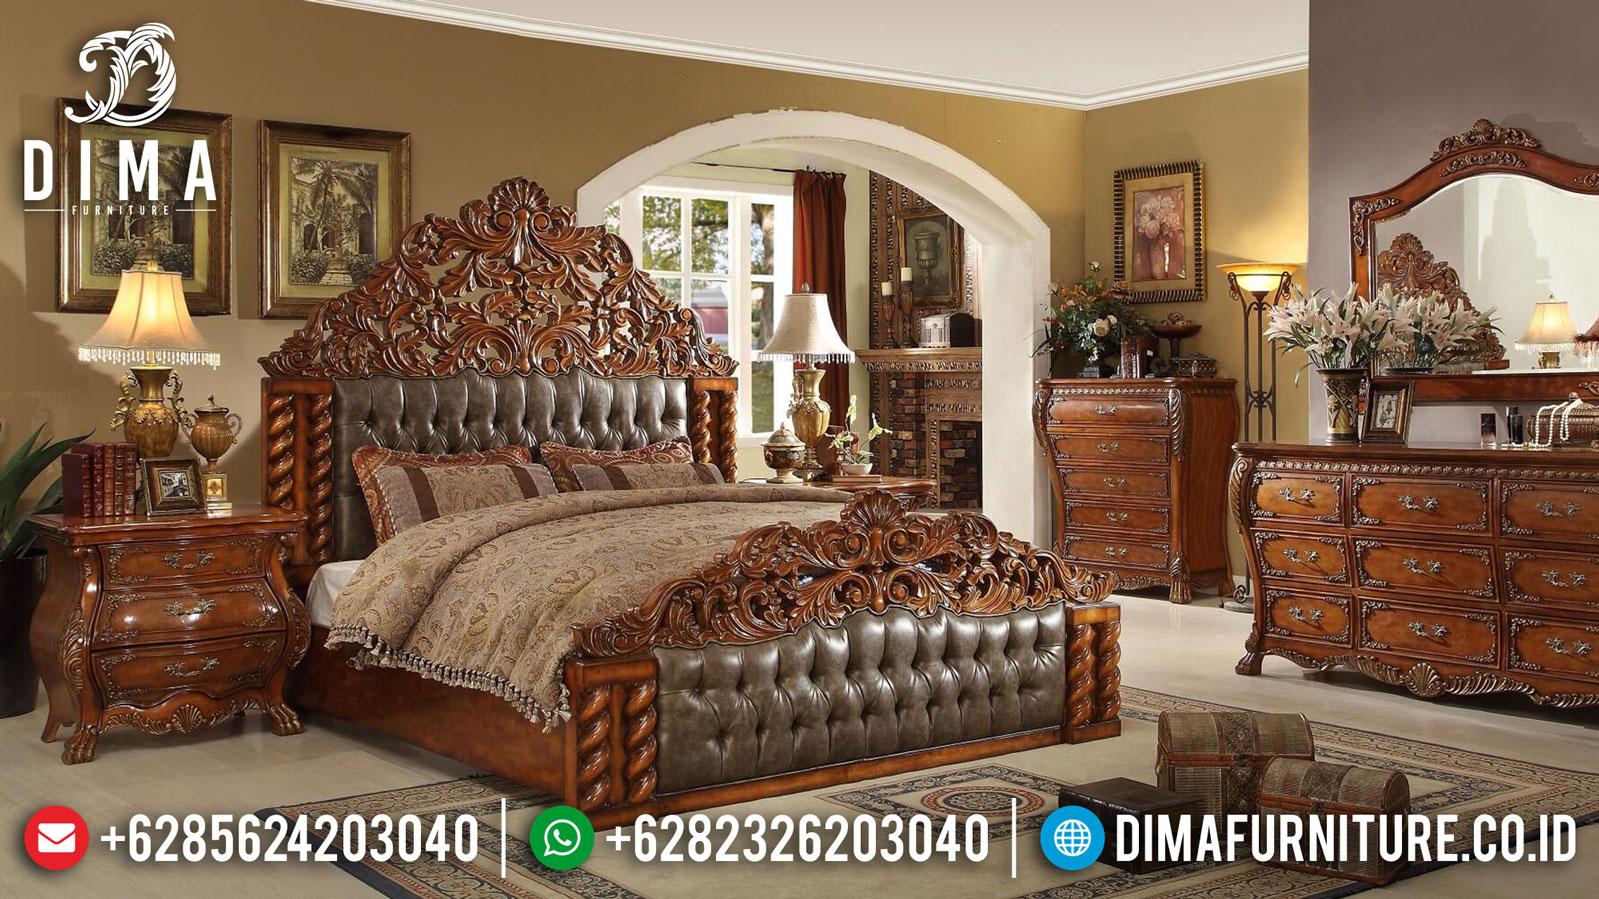 Tempat Tidur Mewah Ukiran Natural Classic Jati Luxury Design TTJ-1328